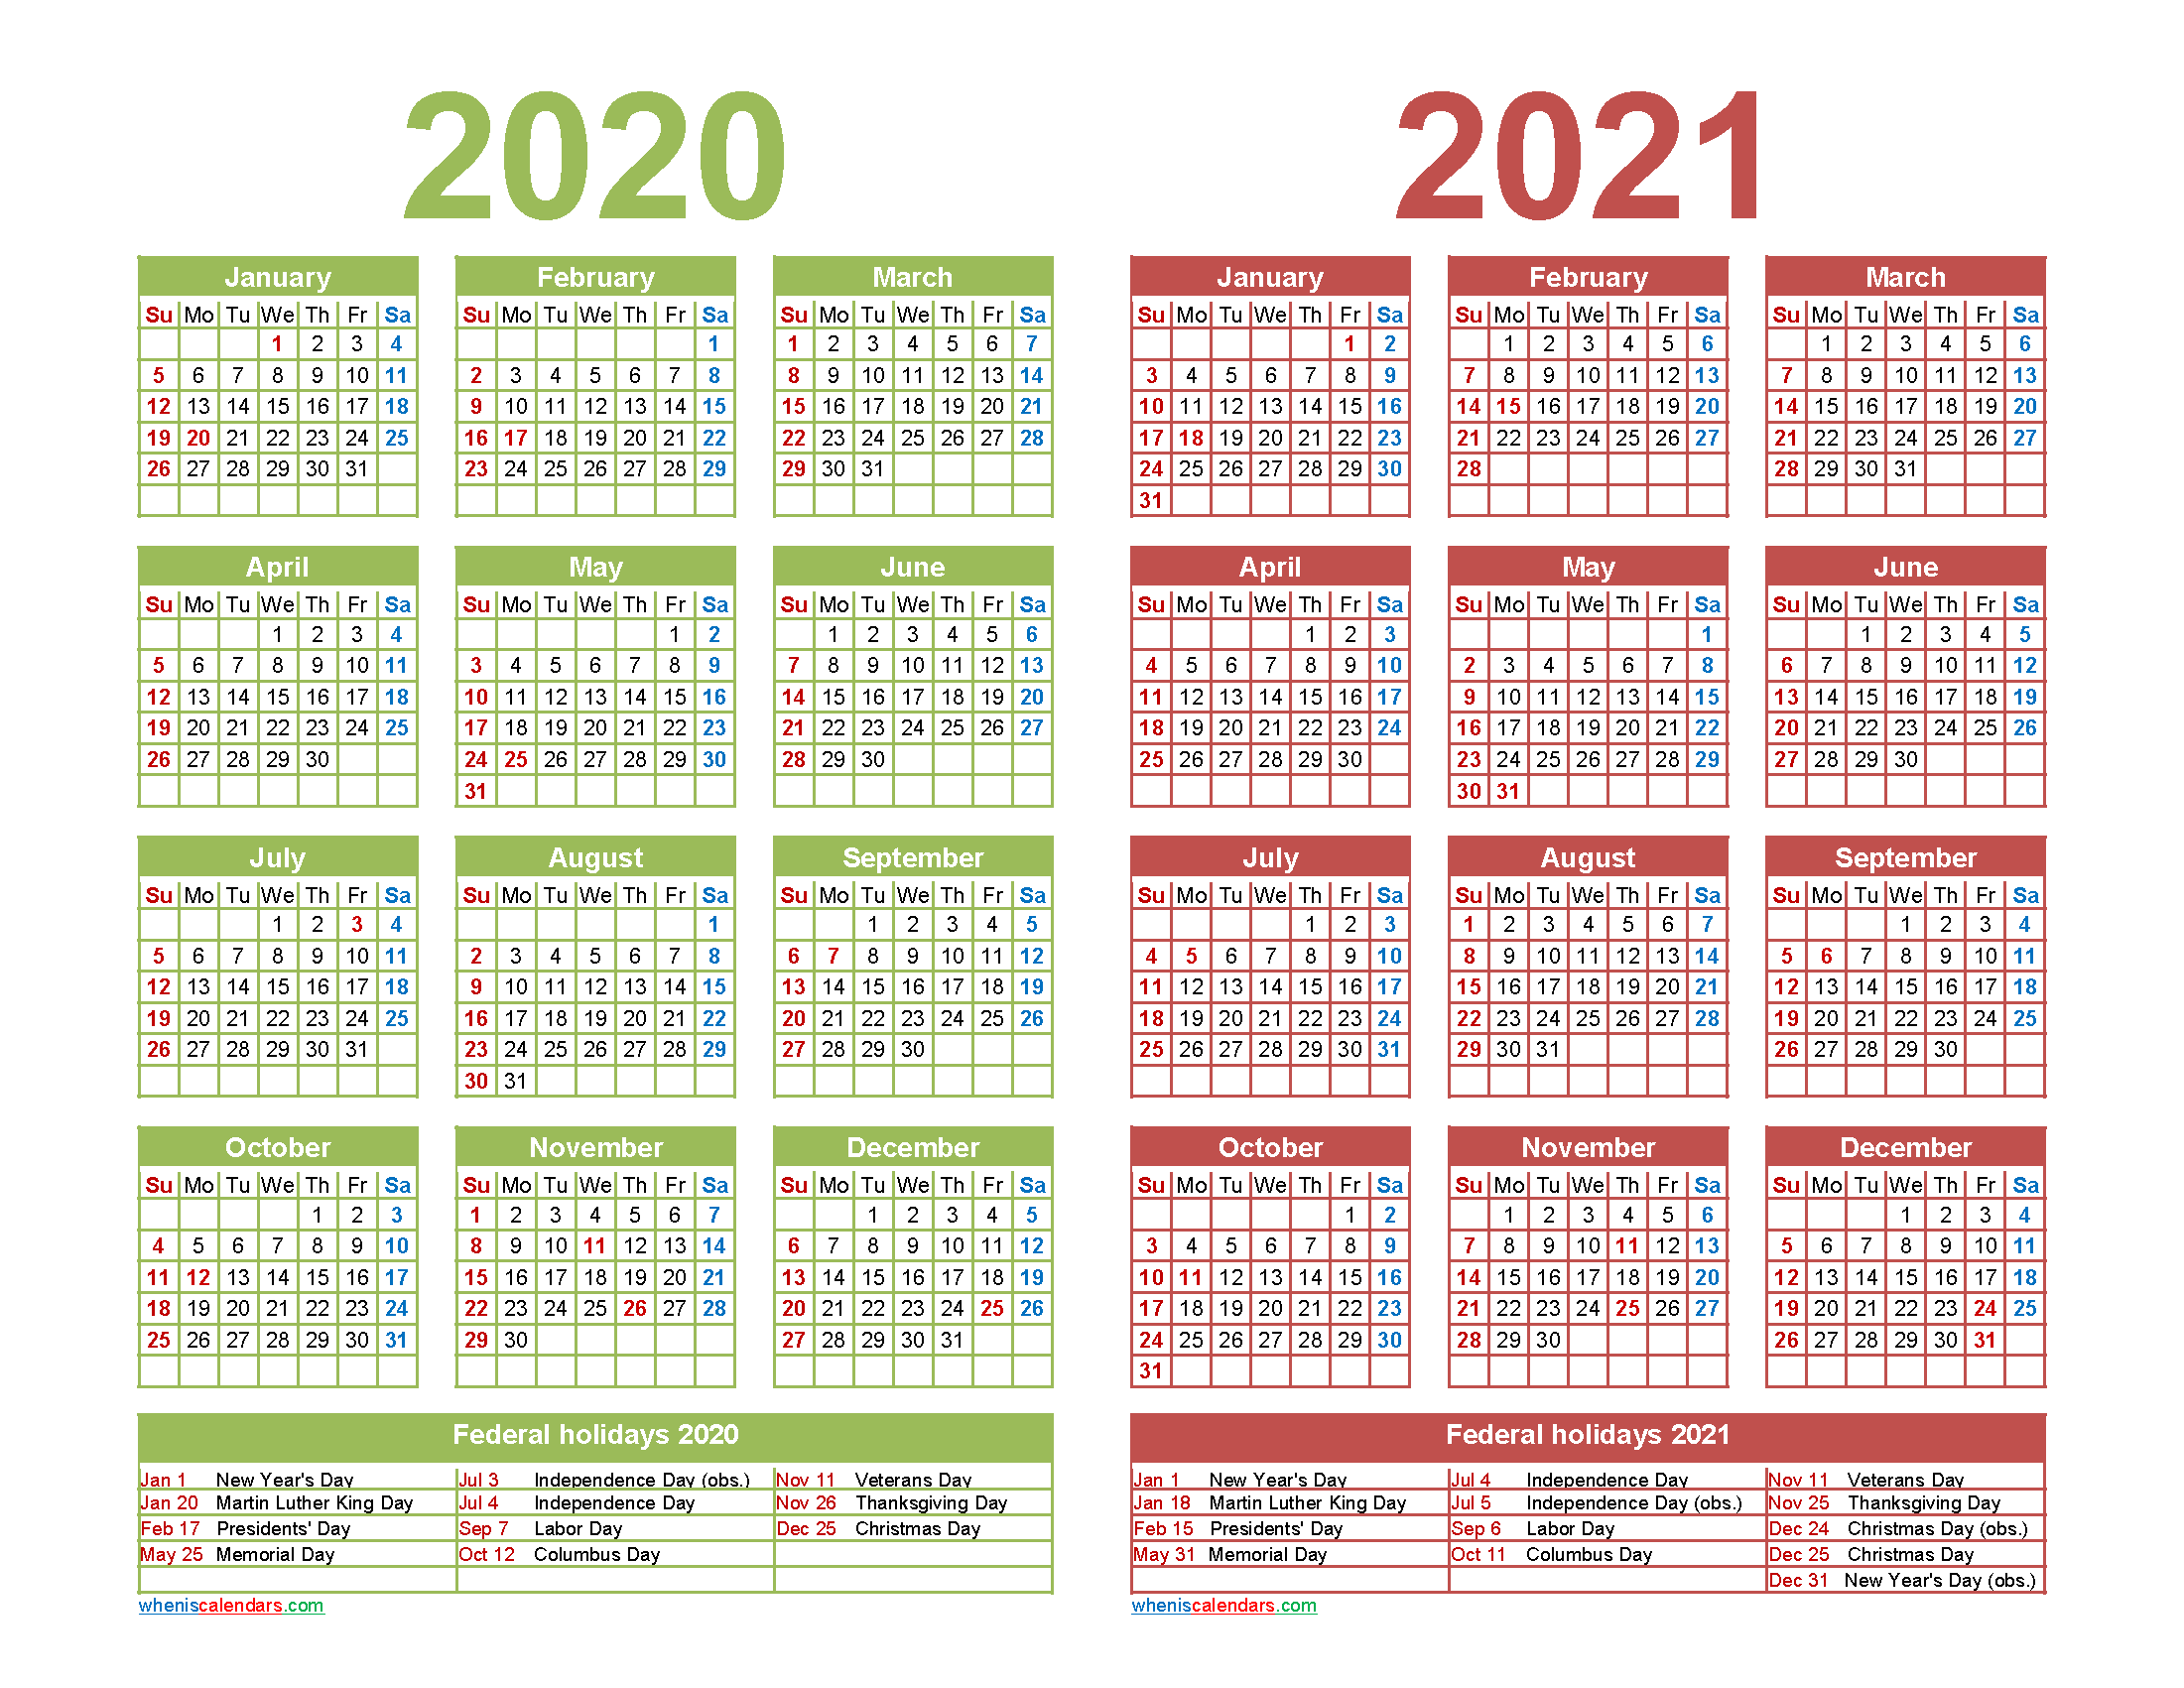 Free 2020 and 2021 Calendar Printable with Holidays